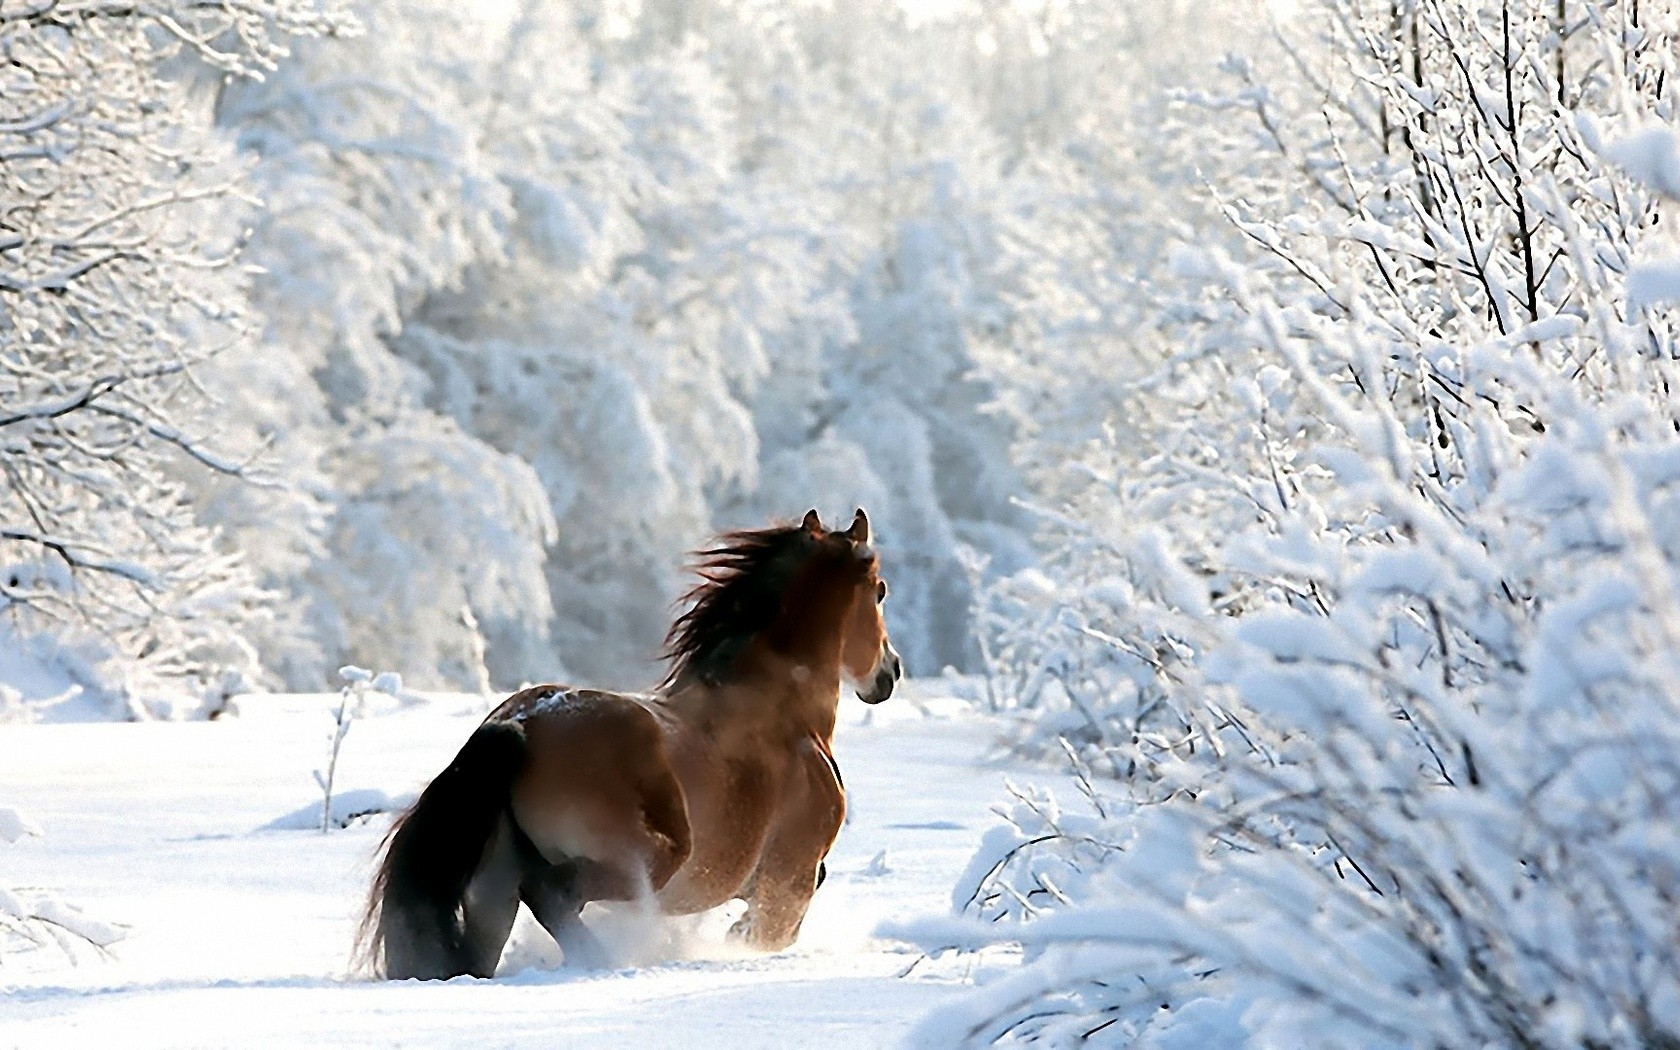 Nature winter snow horses wallpaper 1680x1050 224435 WallpaperUP 1680x1050